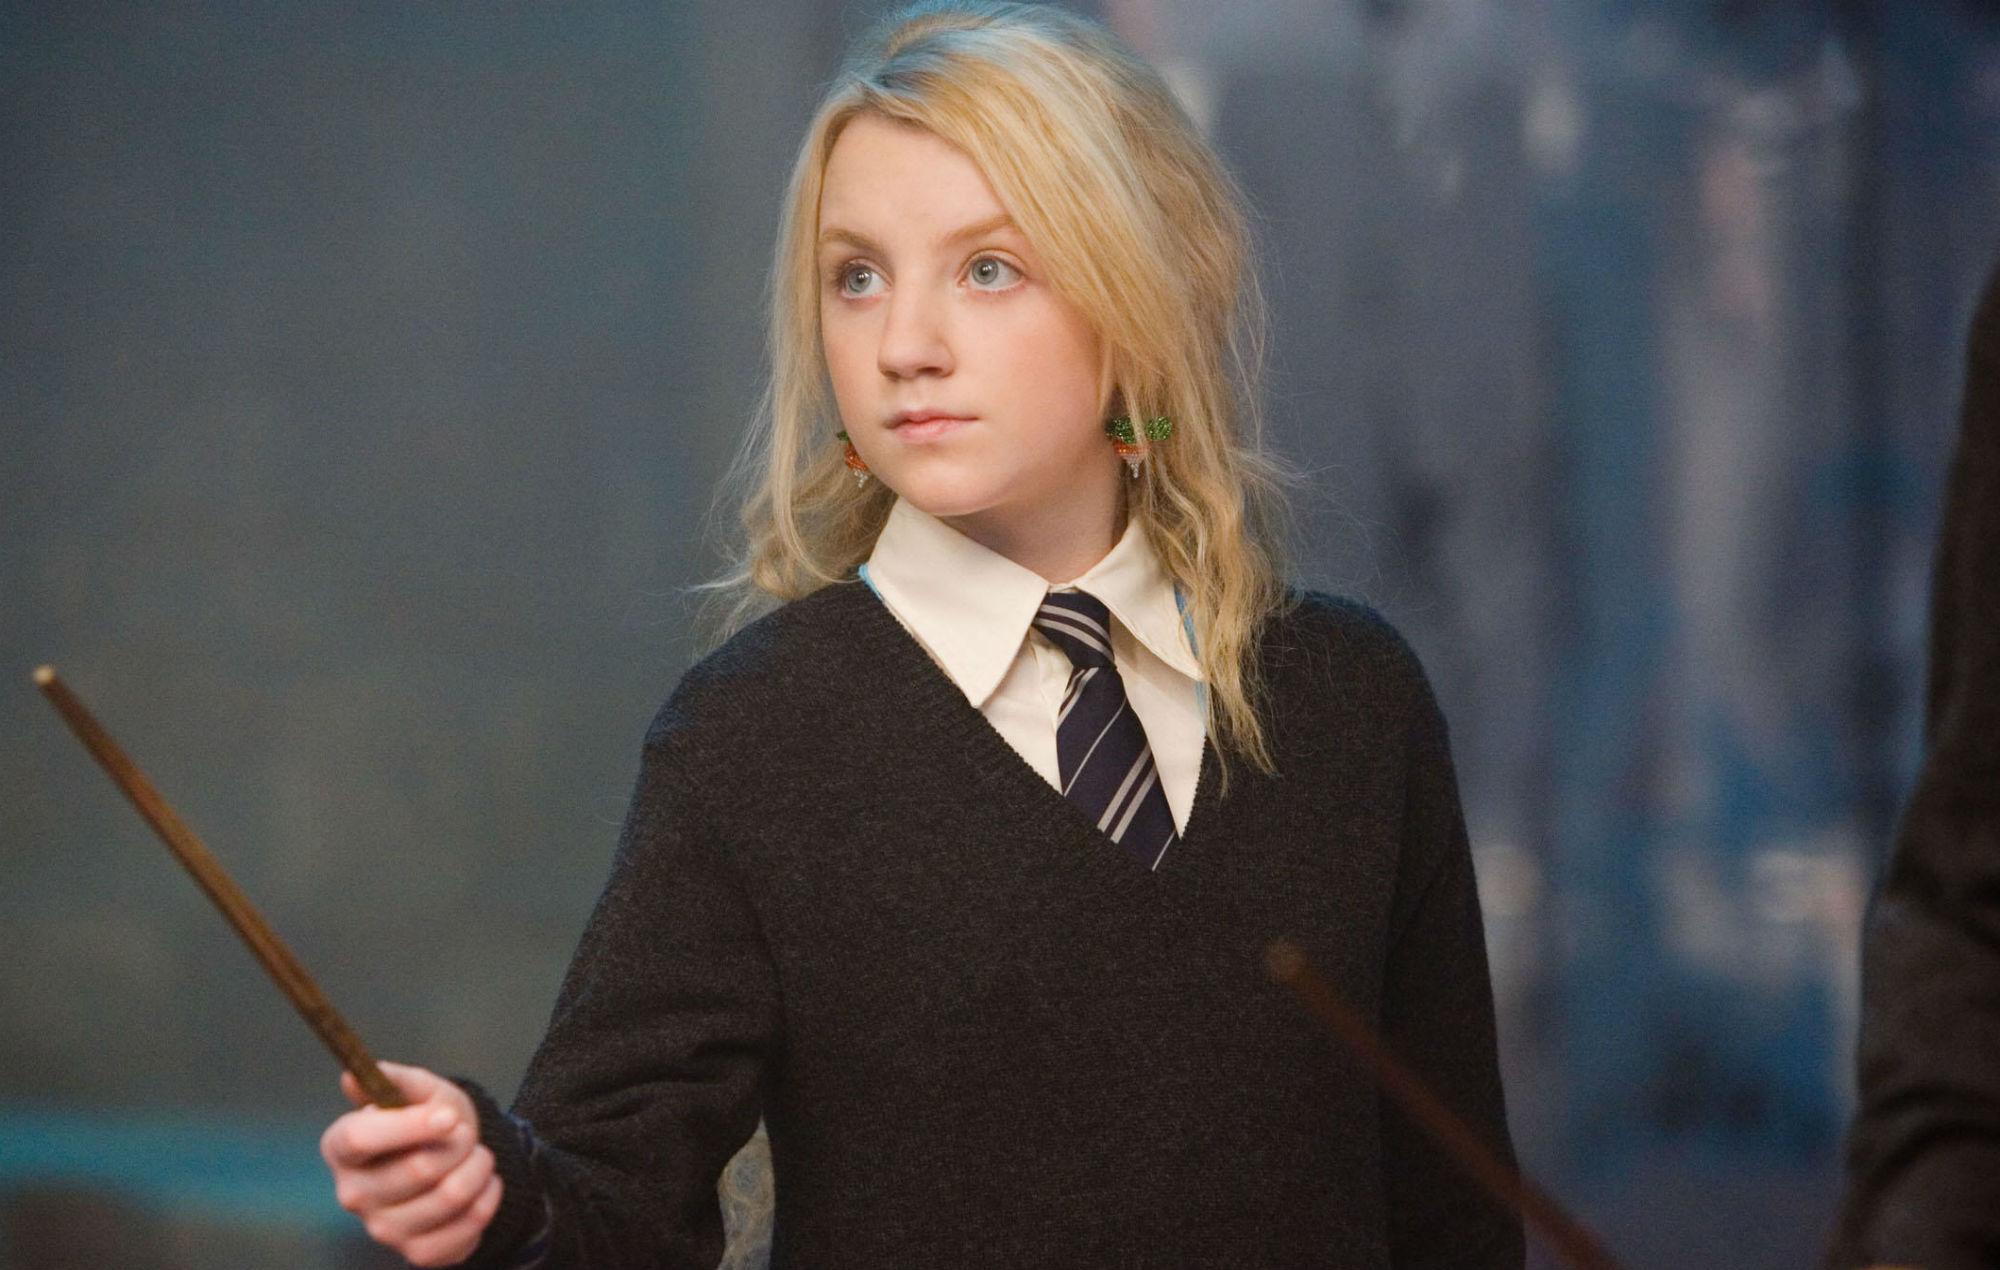 Evanna Lynch as Luna Lovegood in the 'Harry Potter' films